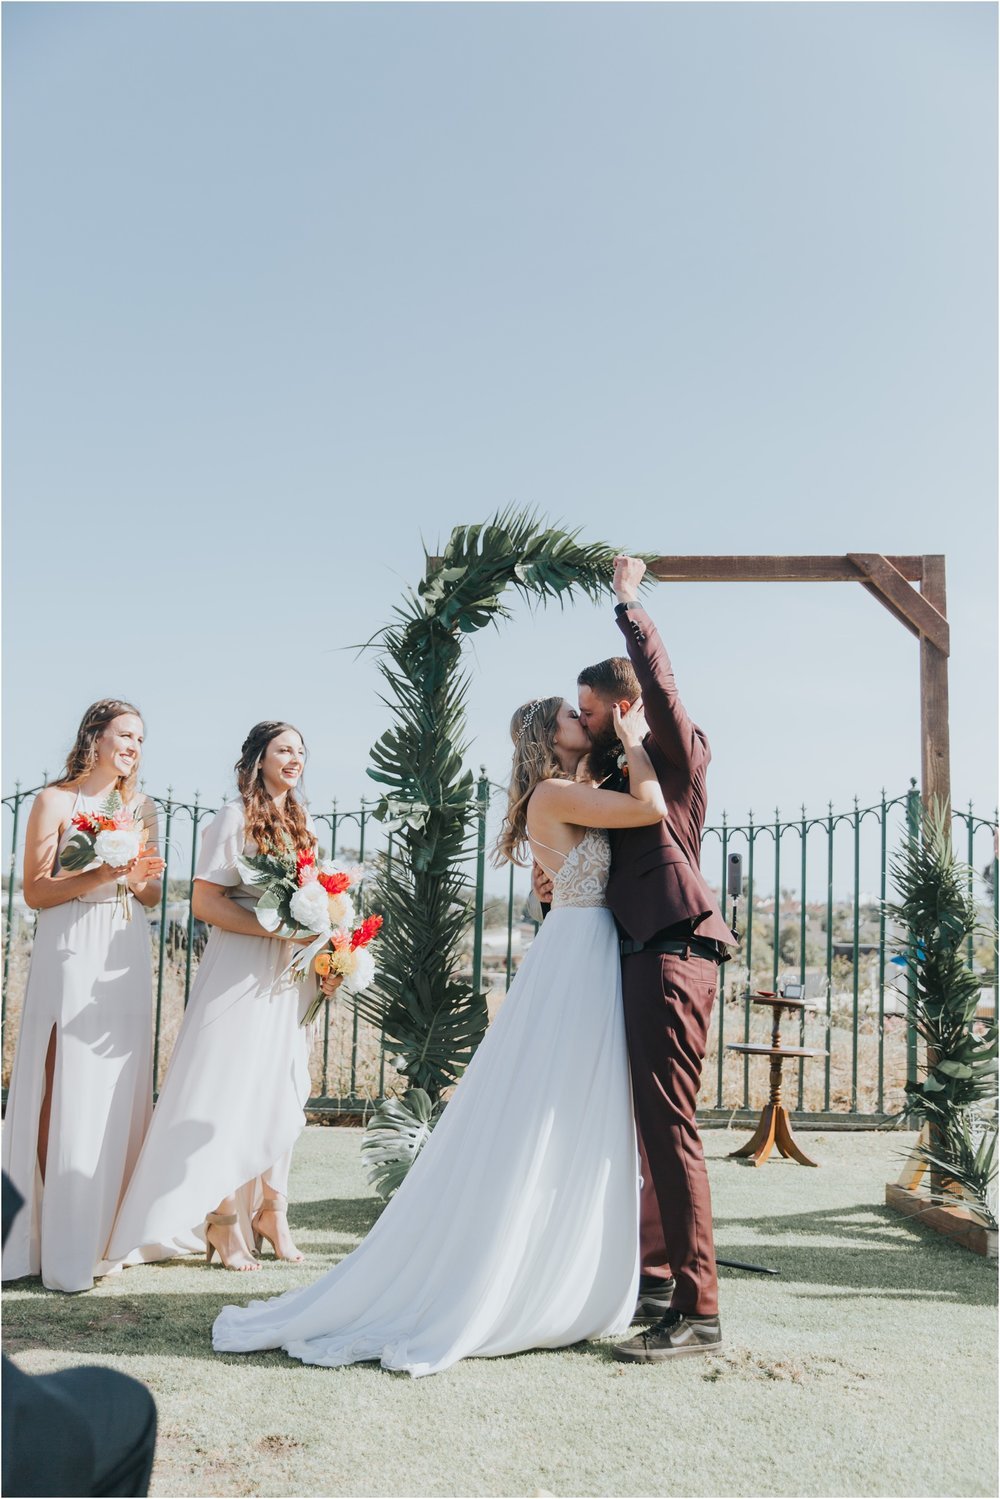 newland_barn_wedding_huntington_beach20181112_063.jpg